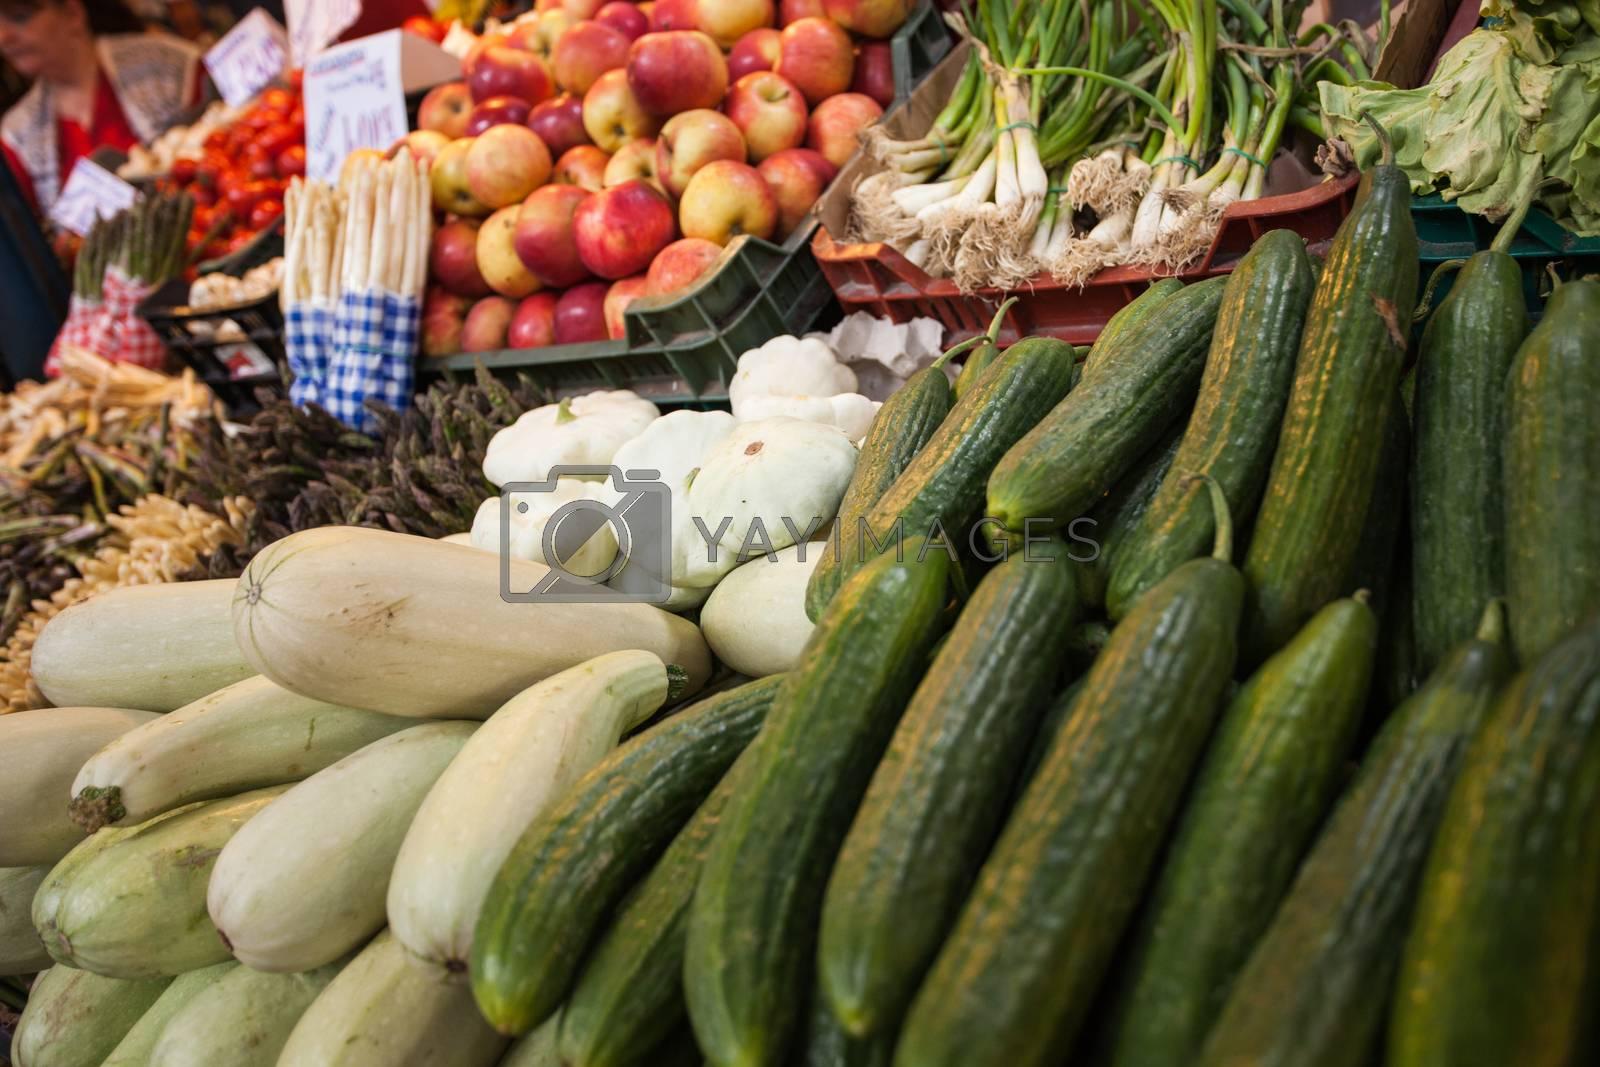 Royalty free image of Food market closeup by fikmik